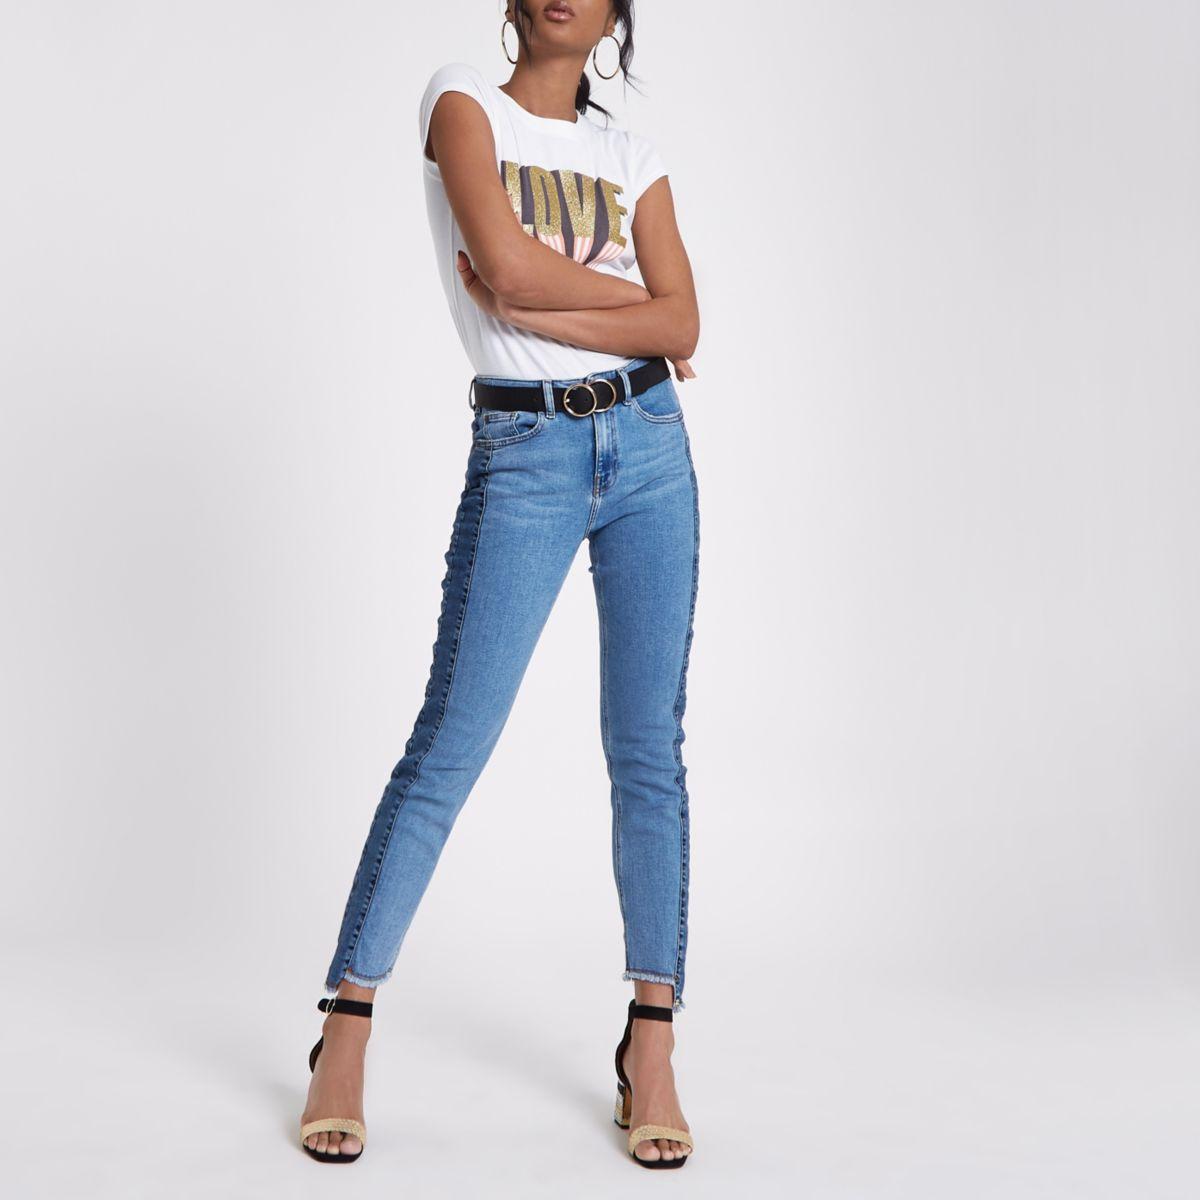 White 'Love' Print Slim Fit T Shirt by River Island